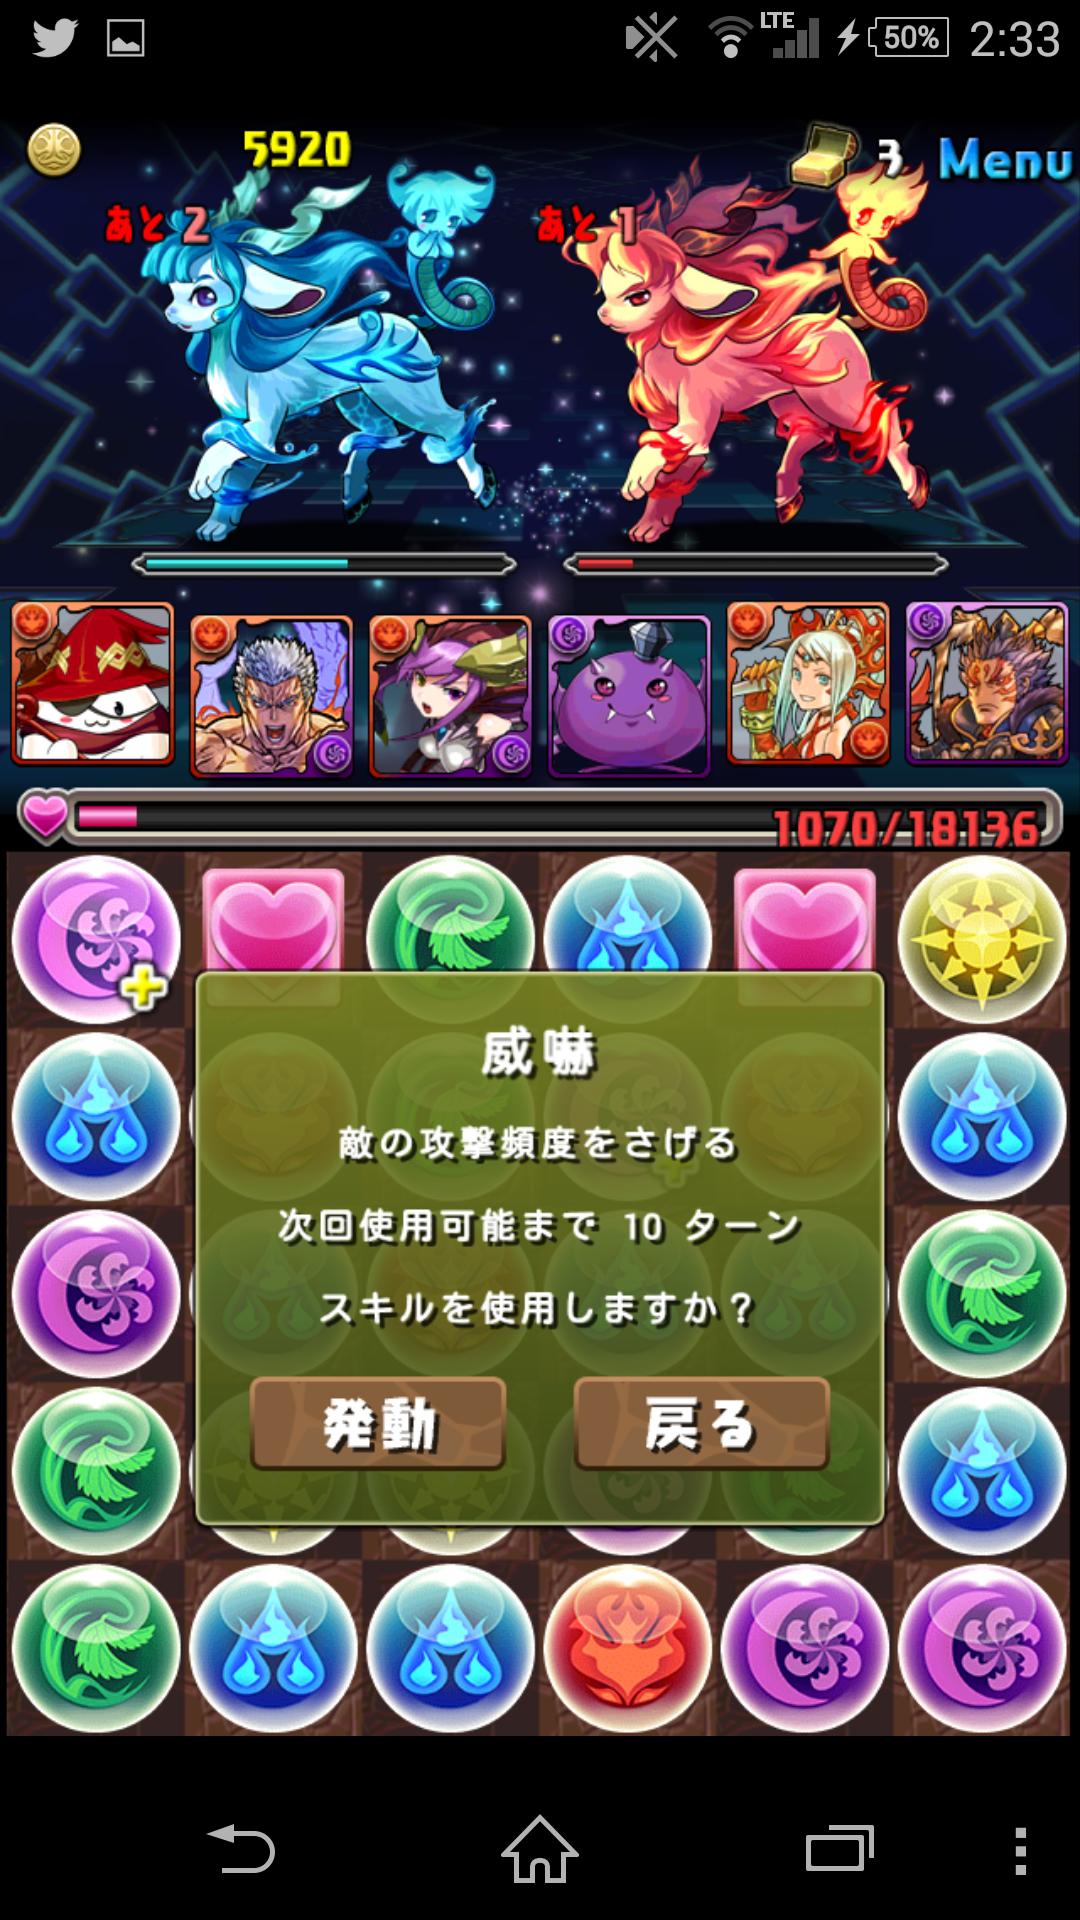 Screenshot_2015-02-18-02-33-26.png